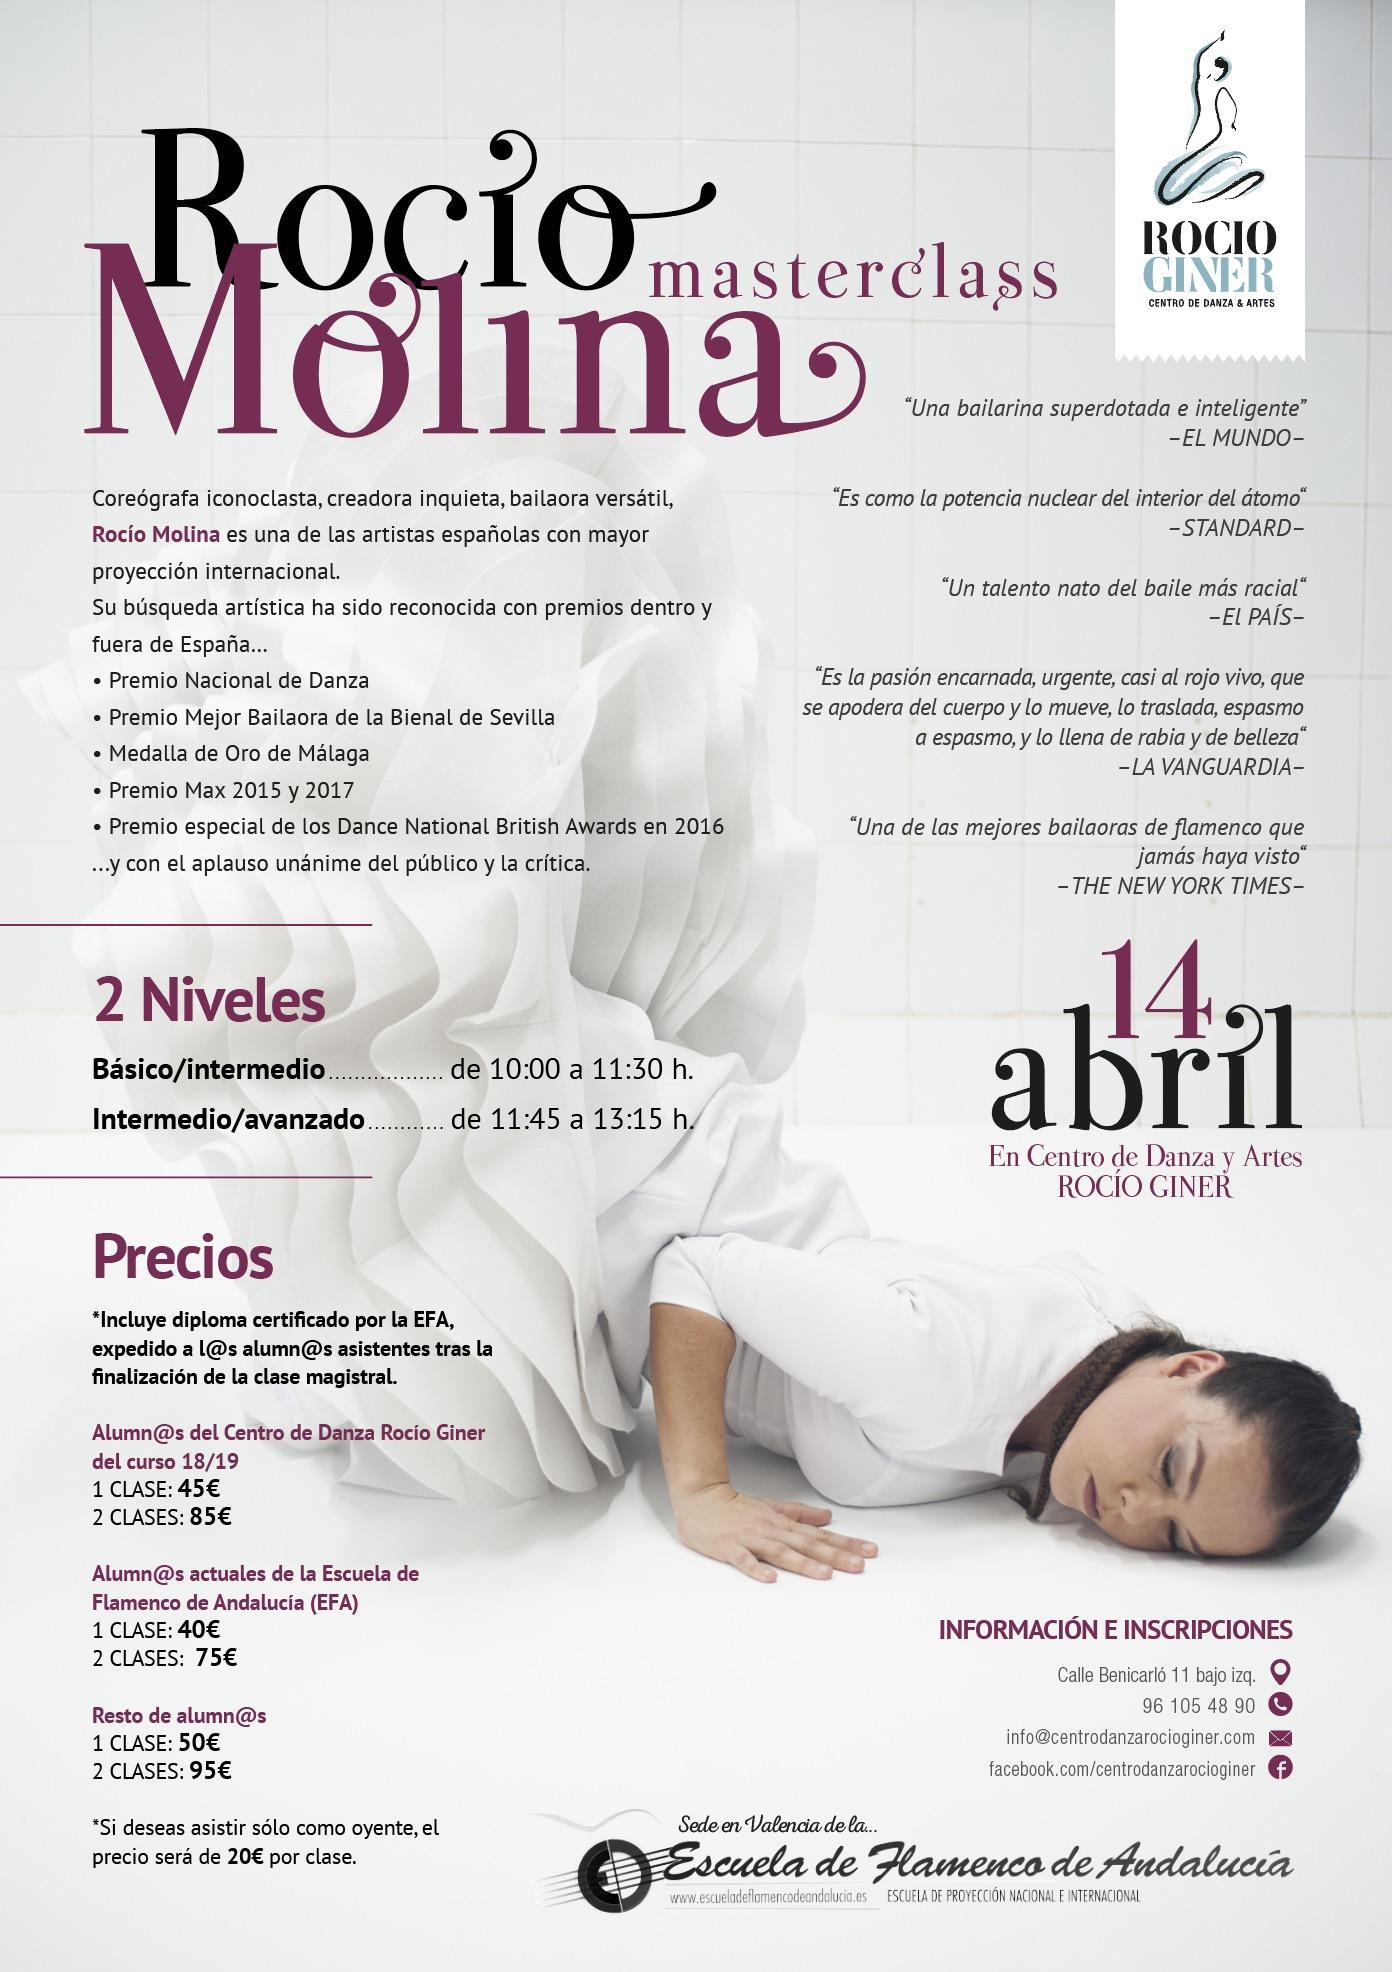 masterclass Rocio Molina